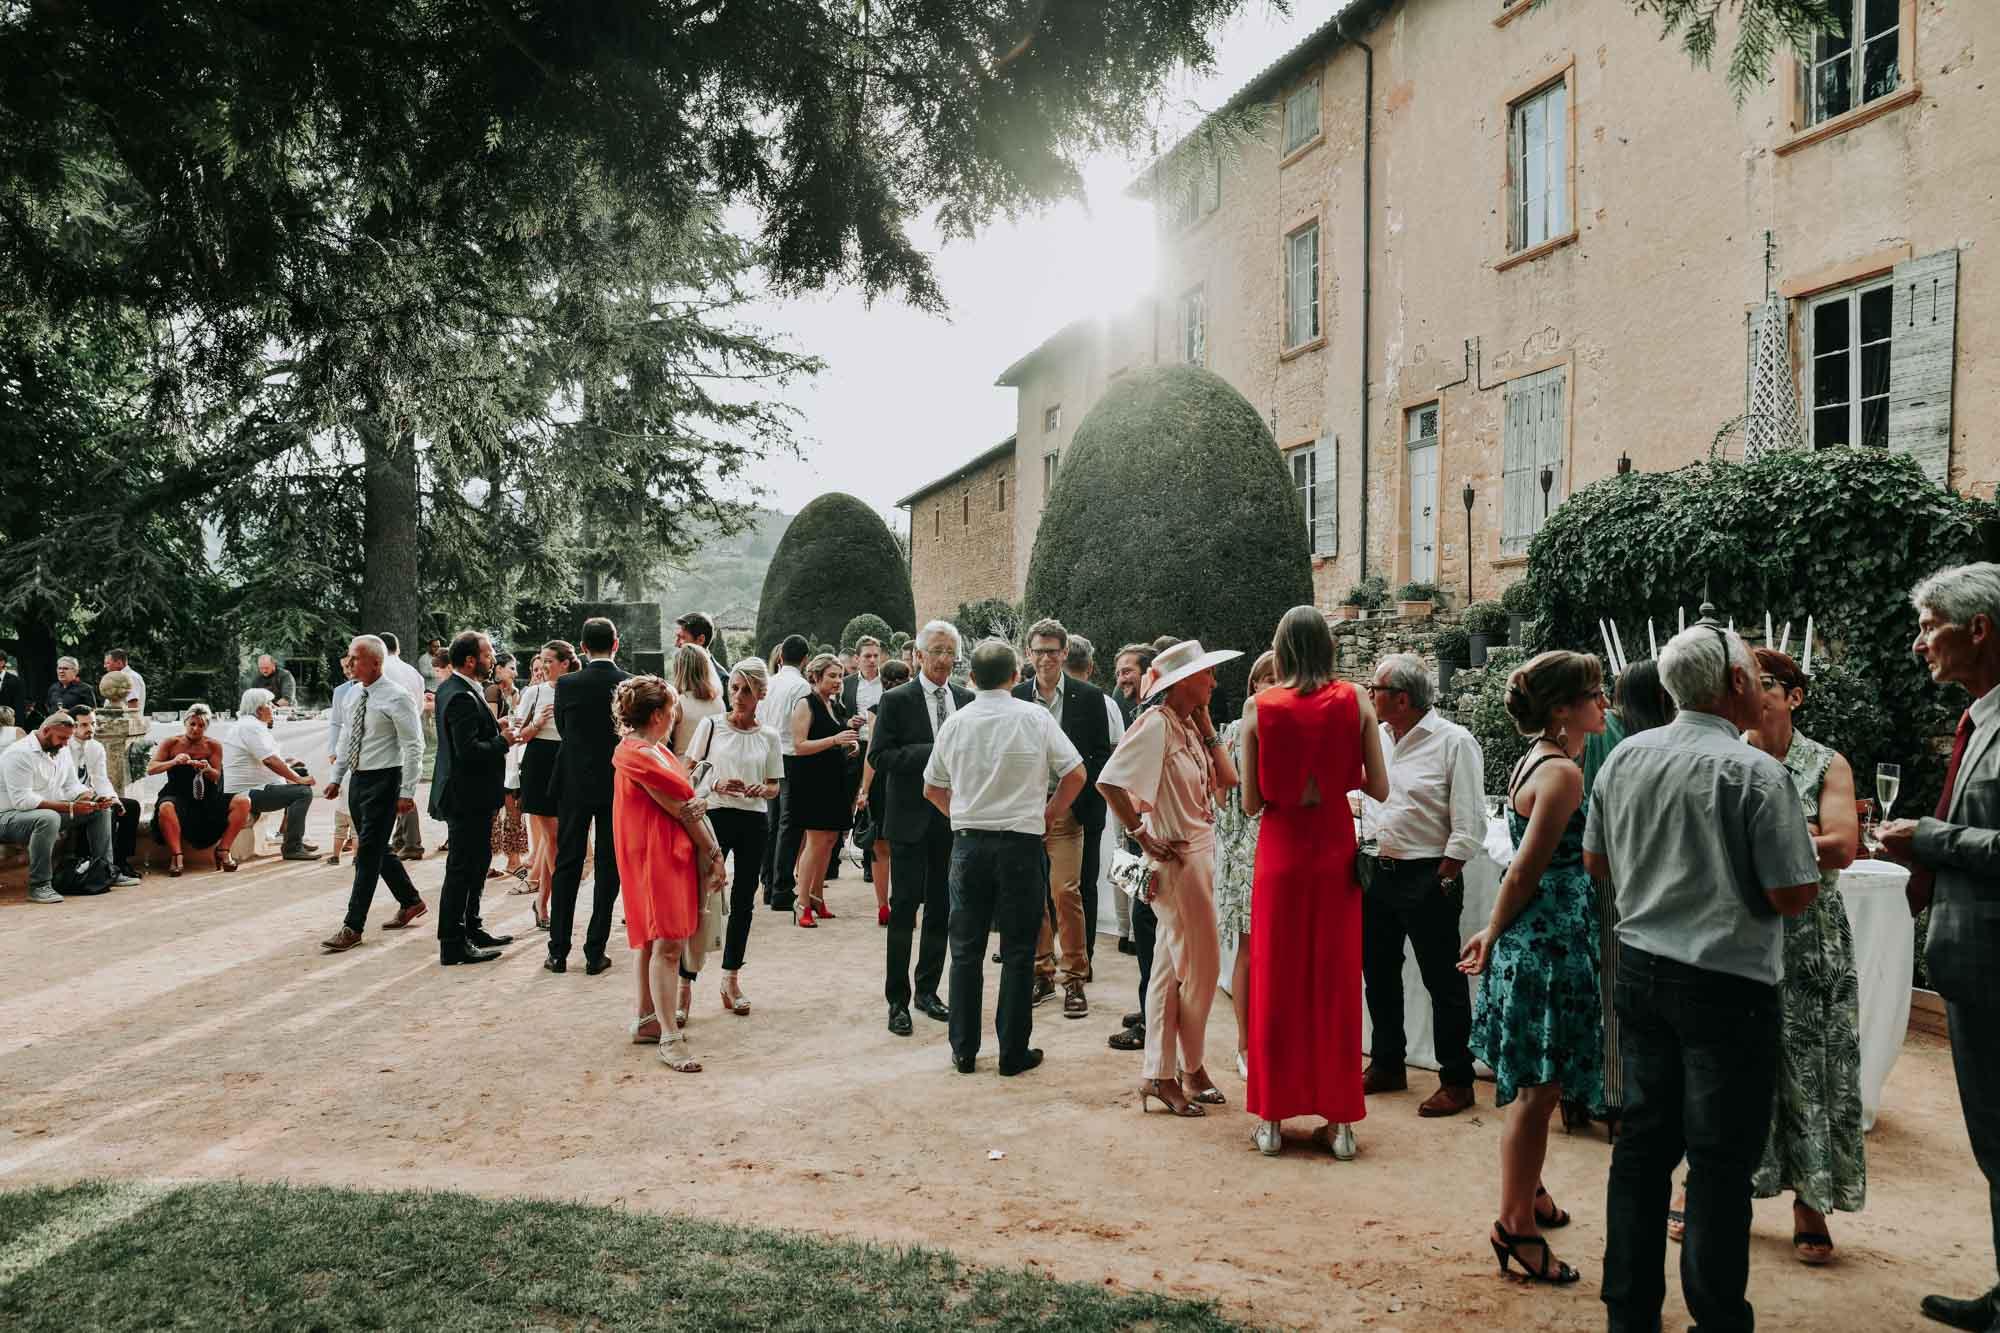 2018-07-21 - LD8_0523 - photographe mariage lyon - laurie diaz - www.lauriediazweeding.com.jpg